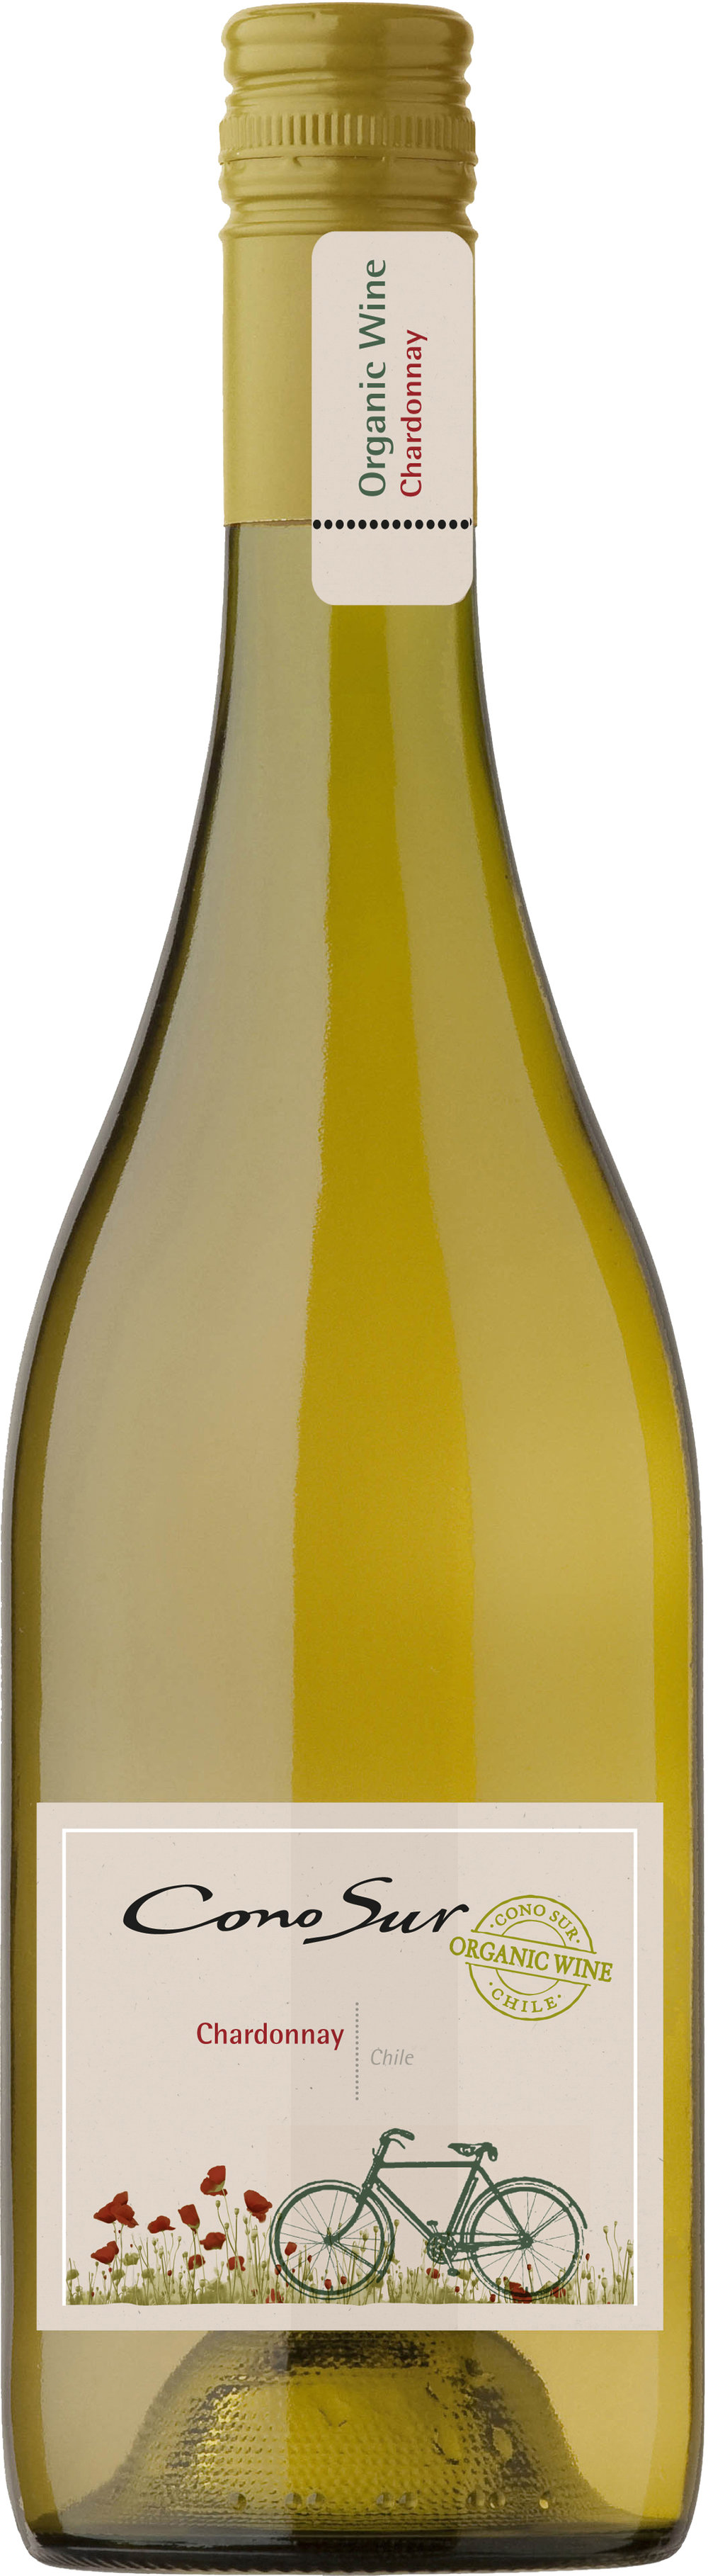 Cono Sur Organic Chardonnay Bottle.jpg